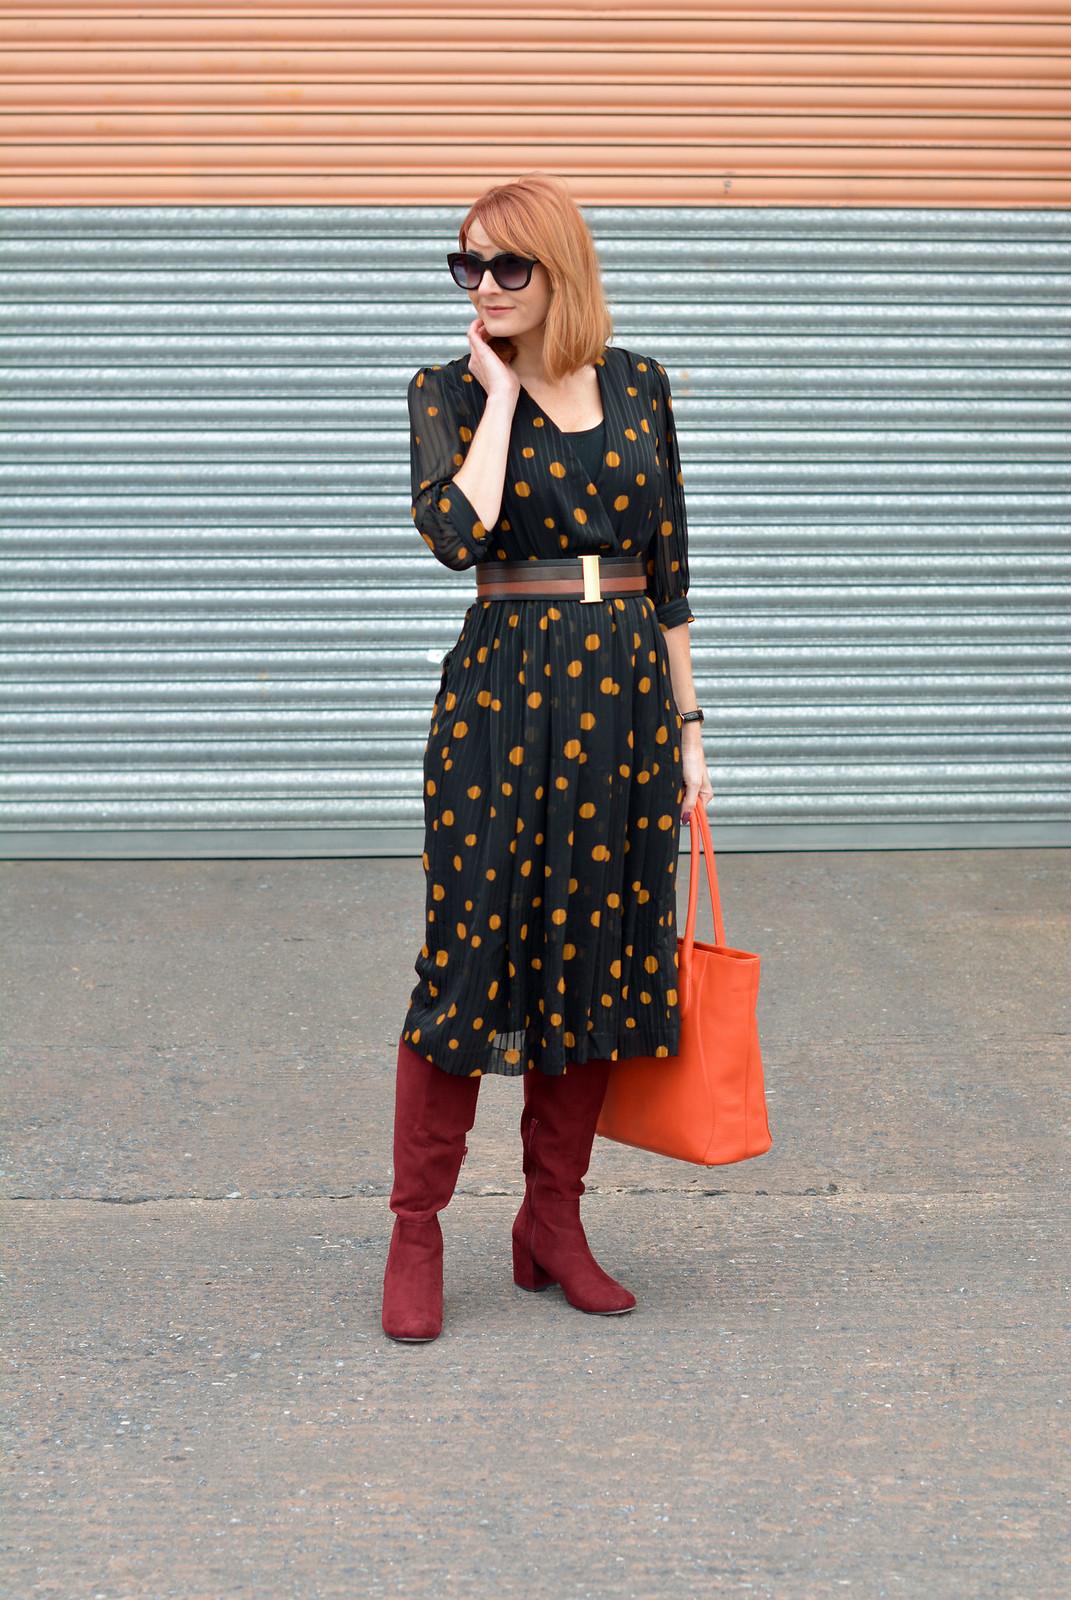 Vintage 70s polka dots dress, burgundy boots, orange tote | Not Dressed As Lamb